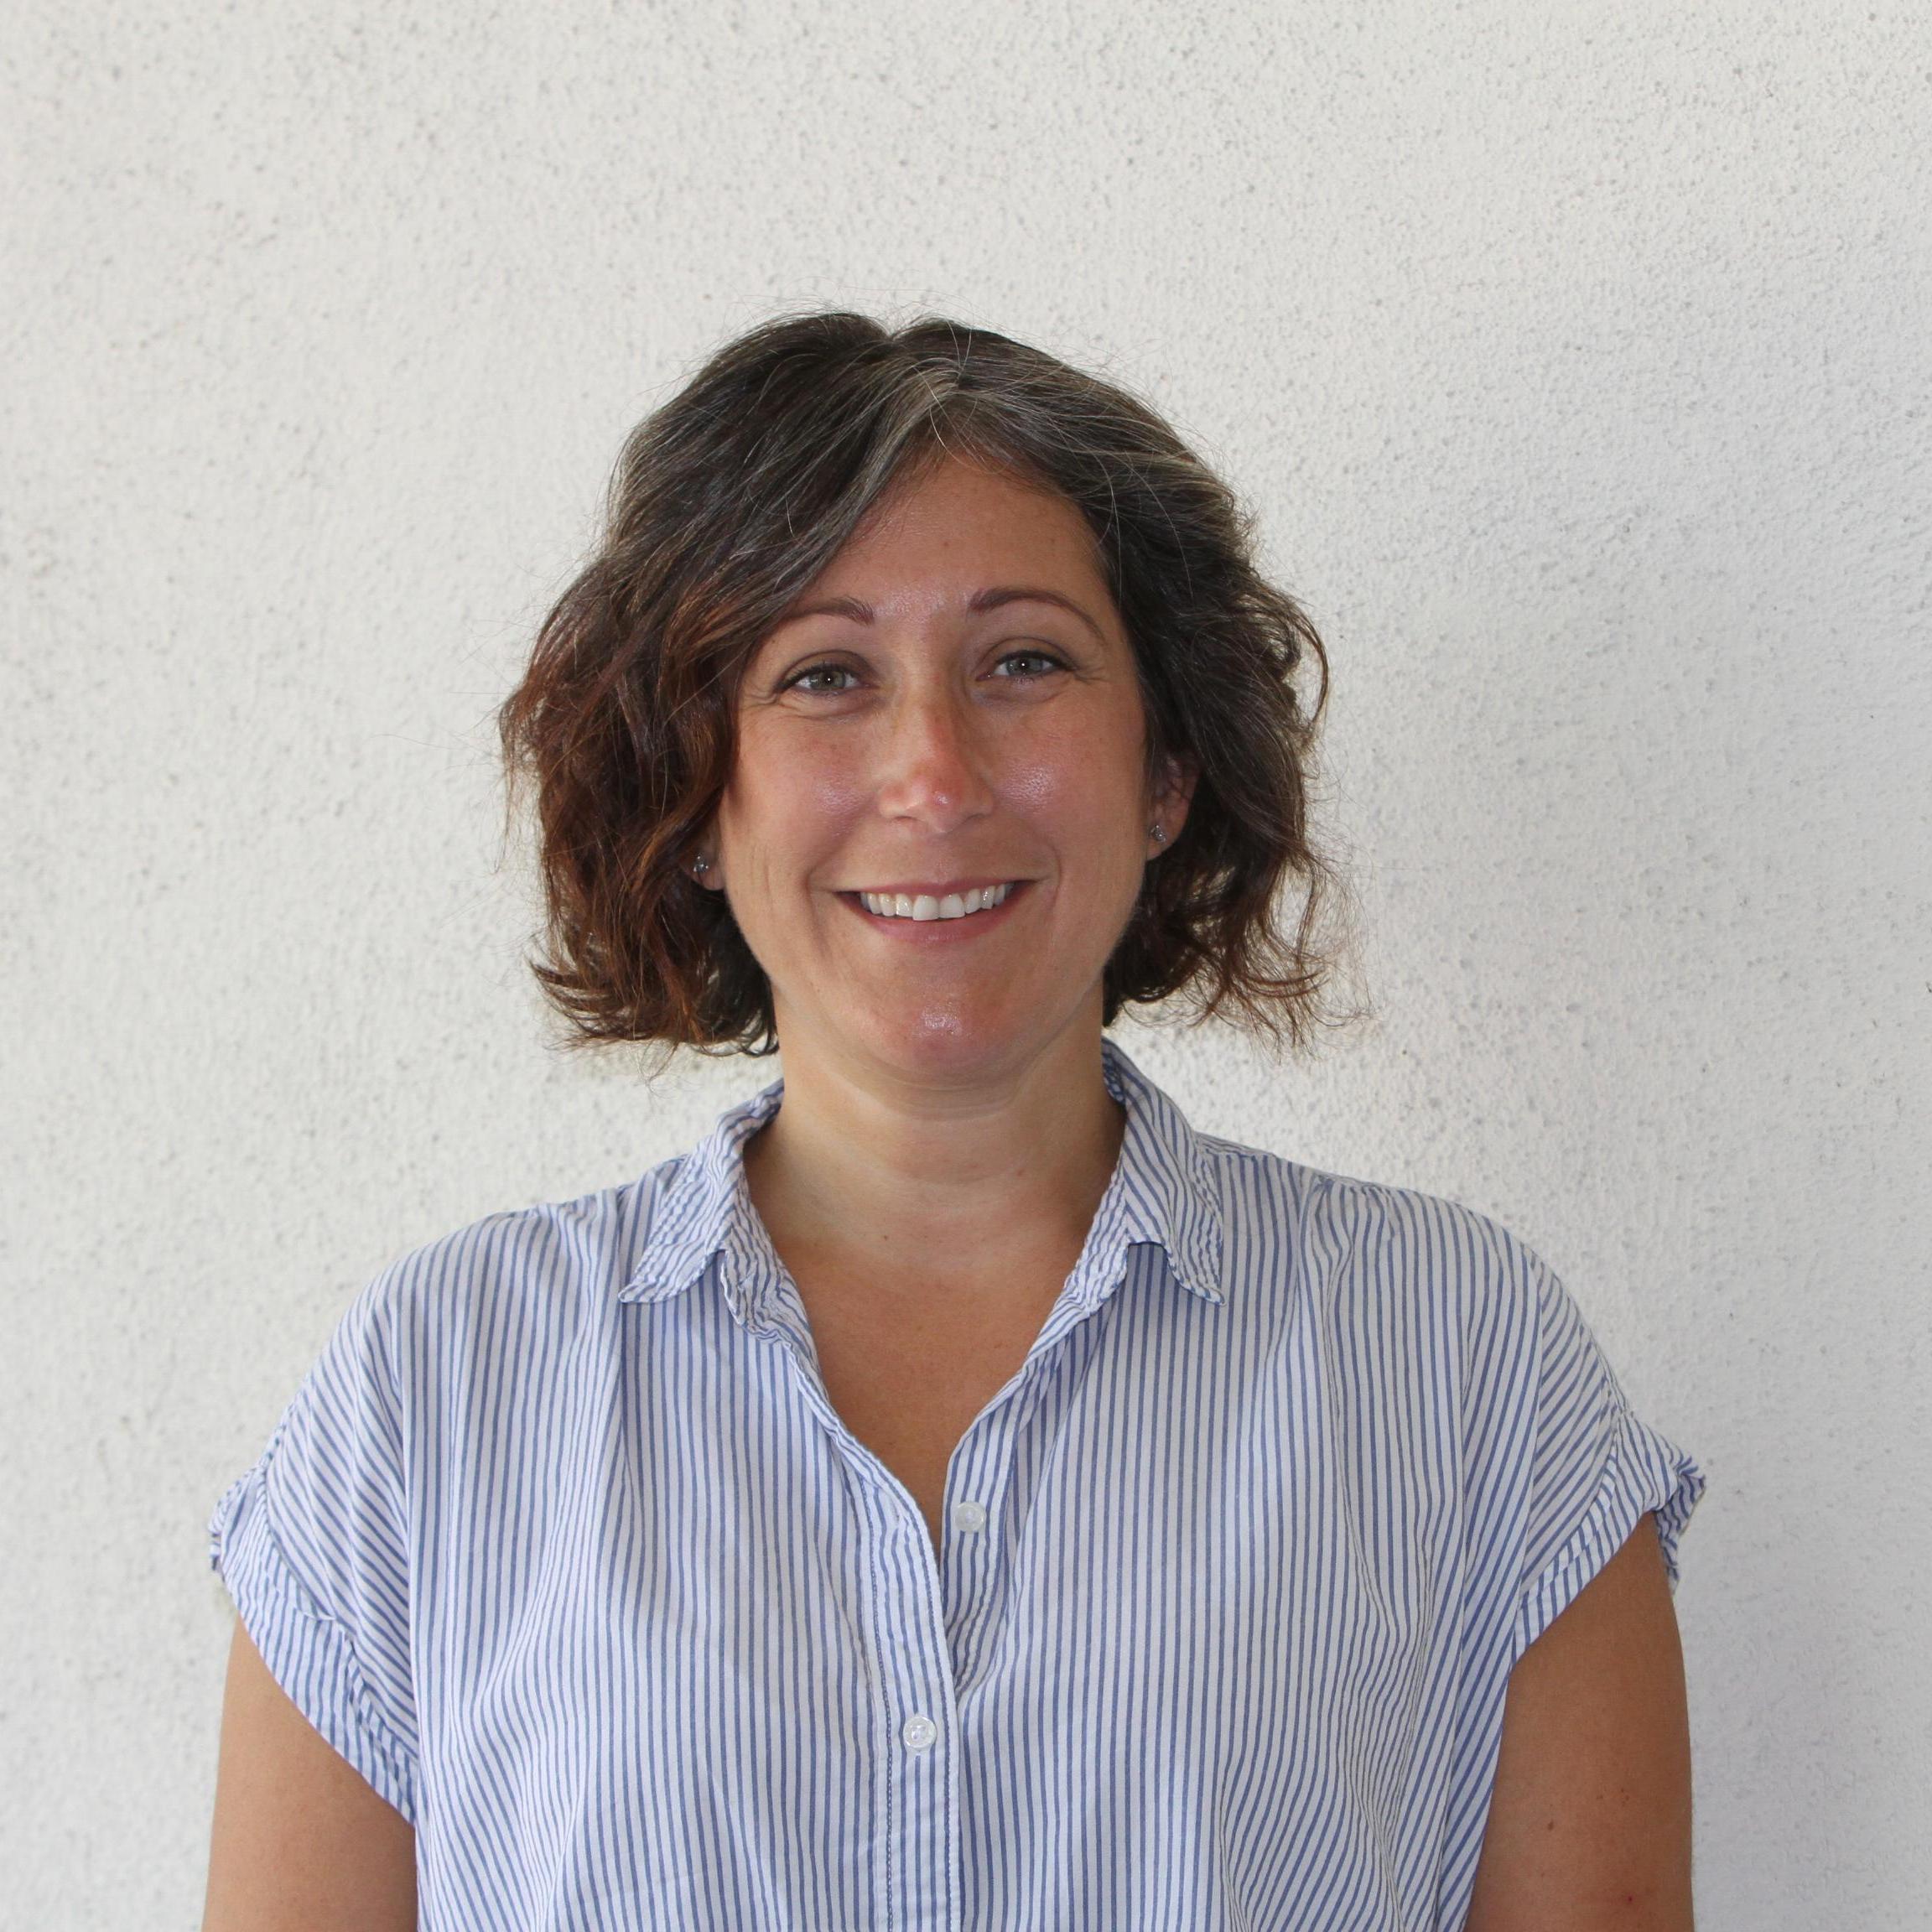 Amanda Newton, BSN, RN's Profile Photo